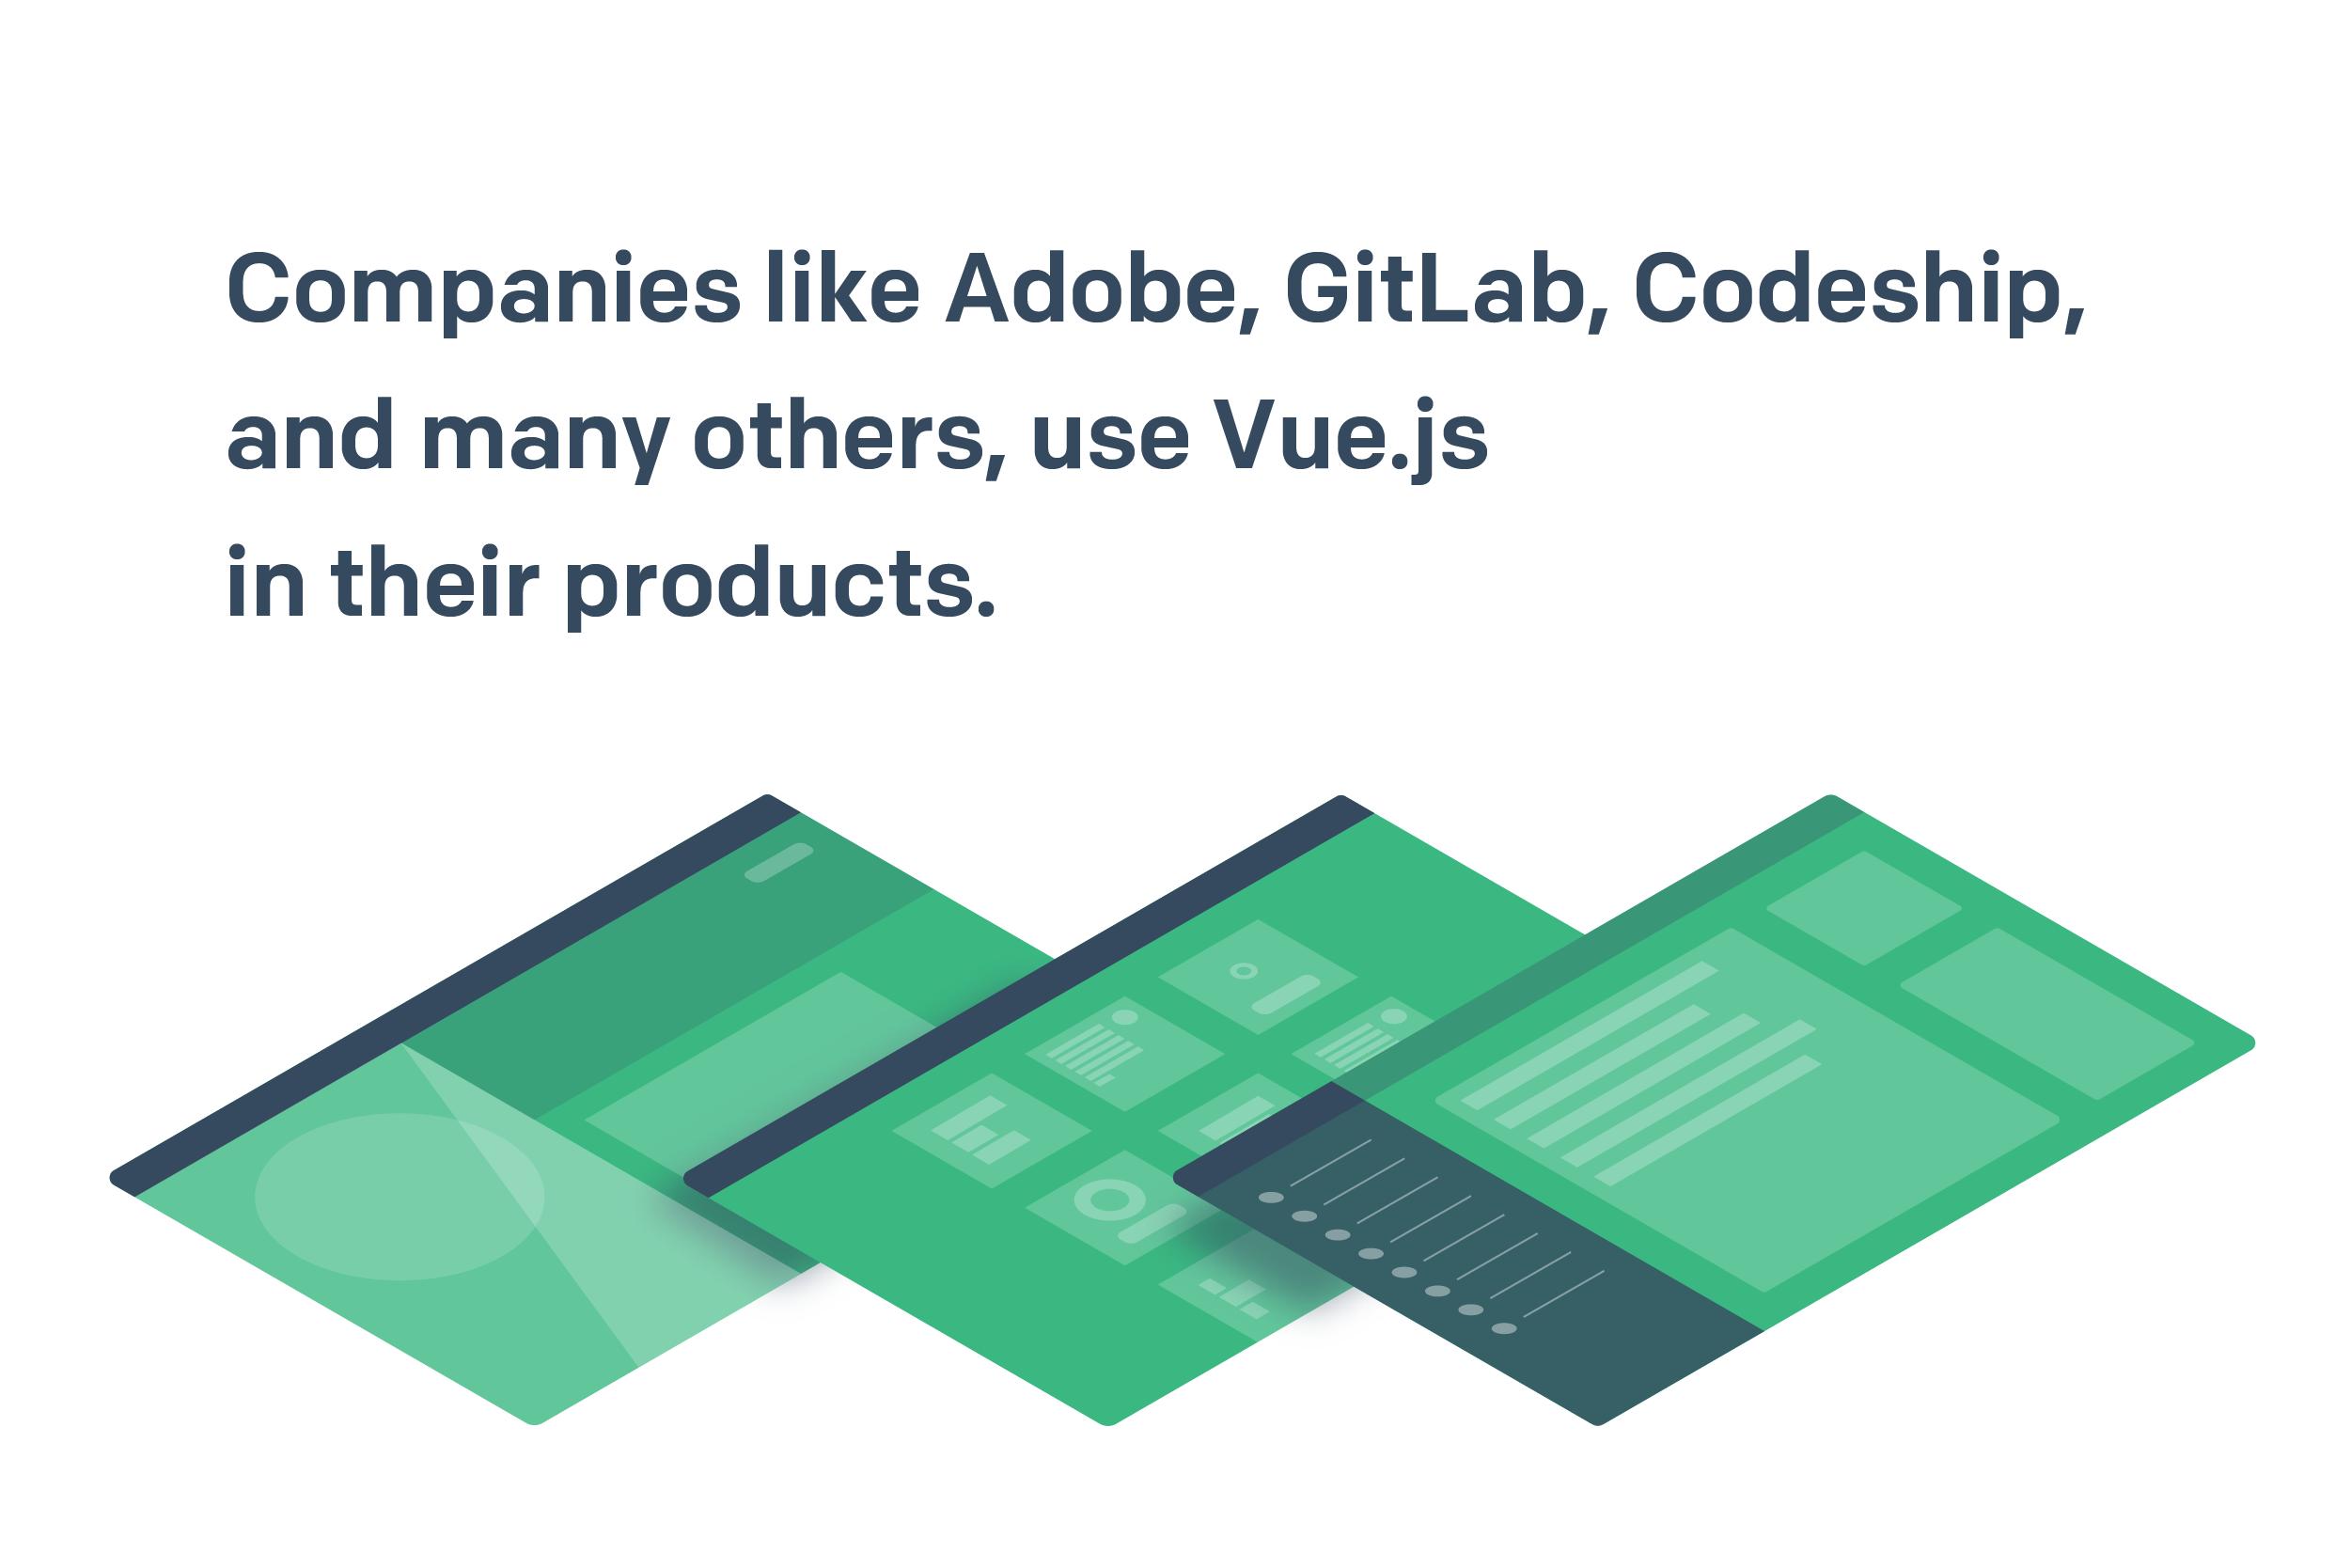 Vue.js for commercial purposes